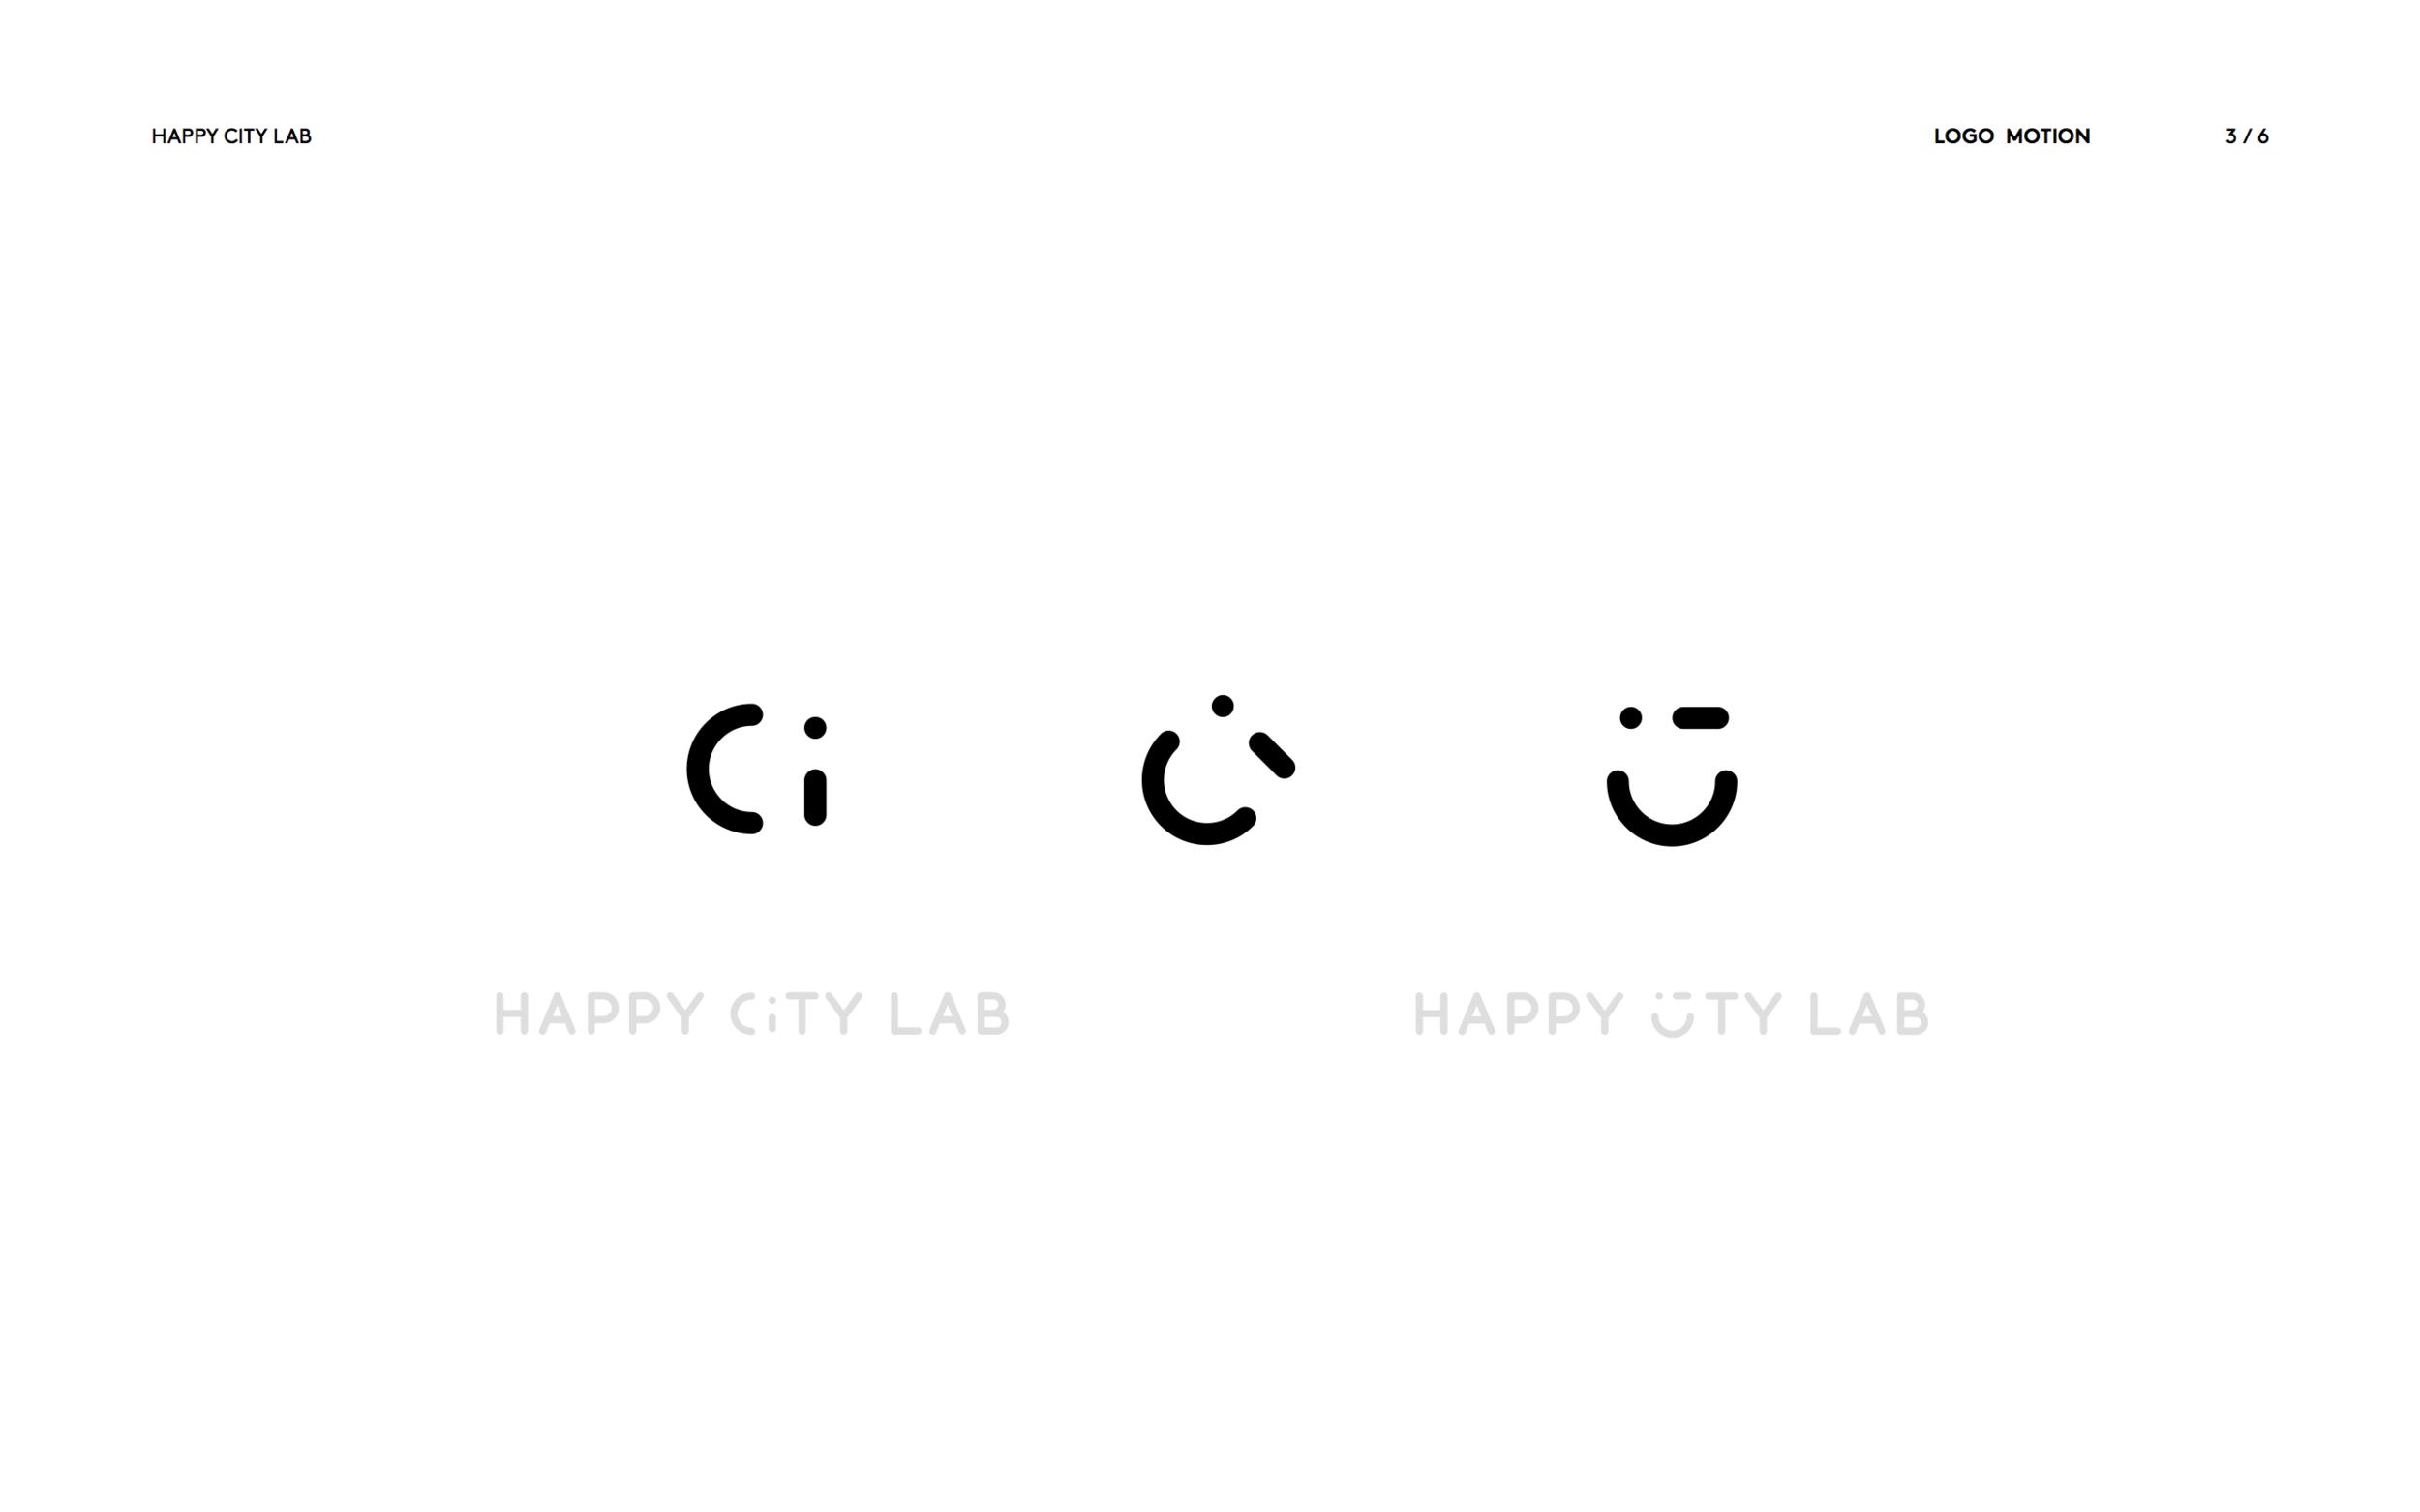 Logo_Happy City Lab 3.png